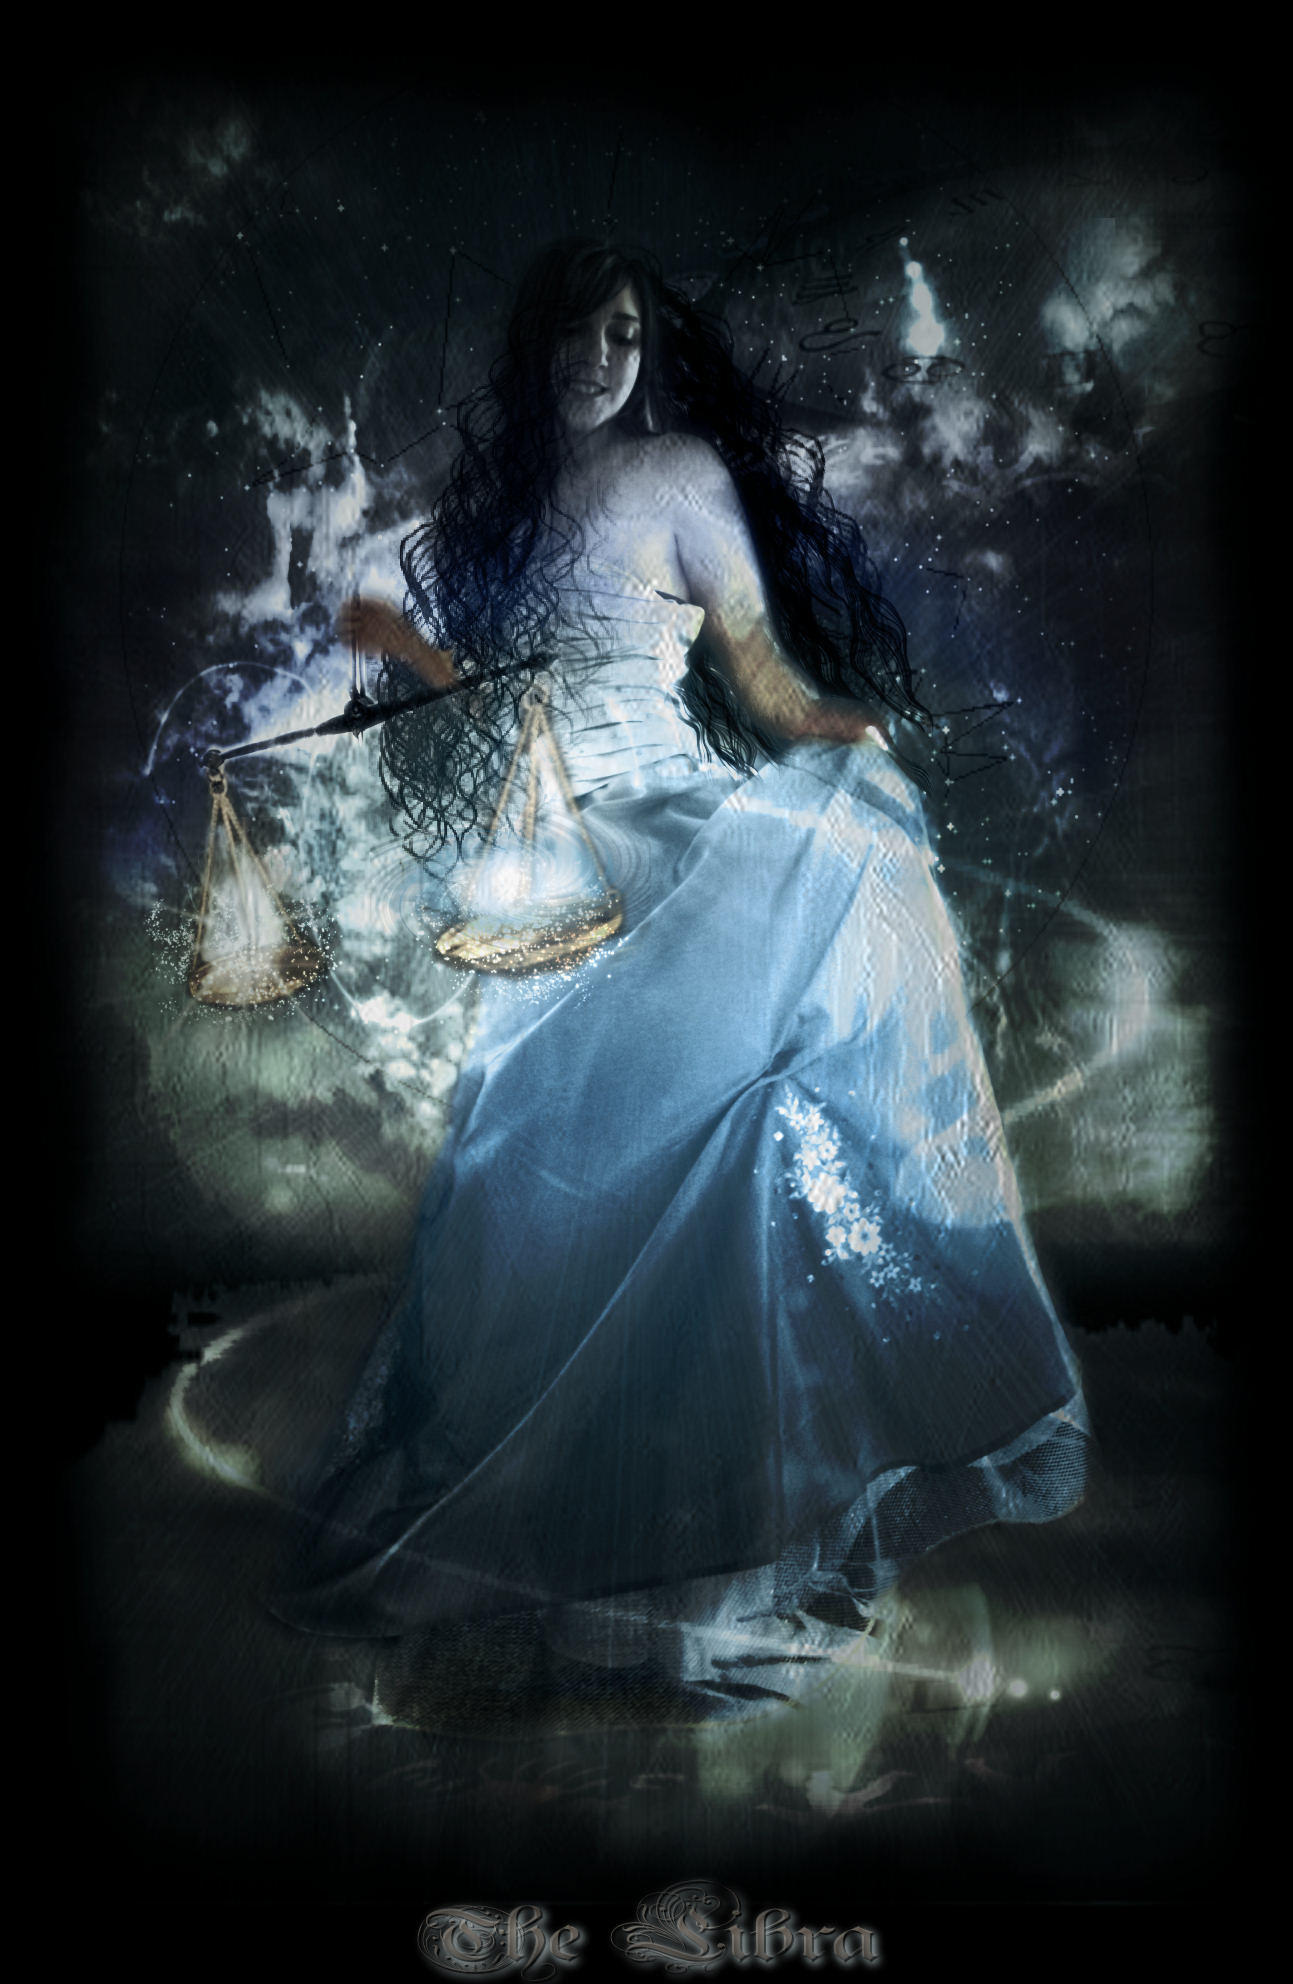 The libra by azurylipfe